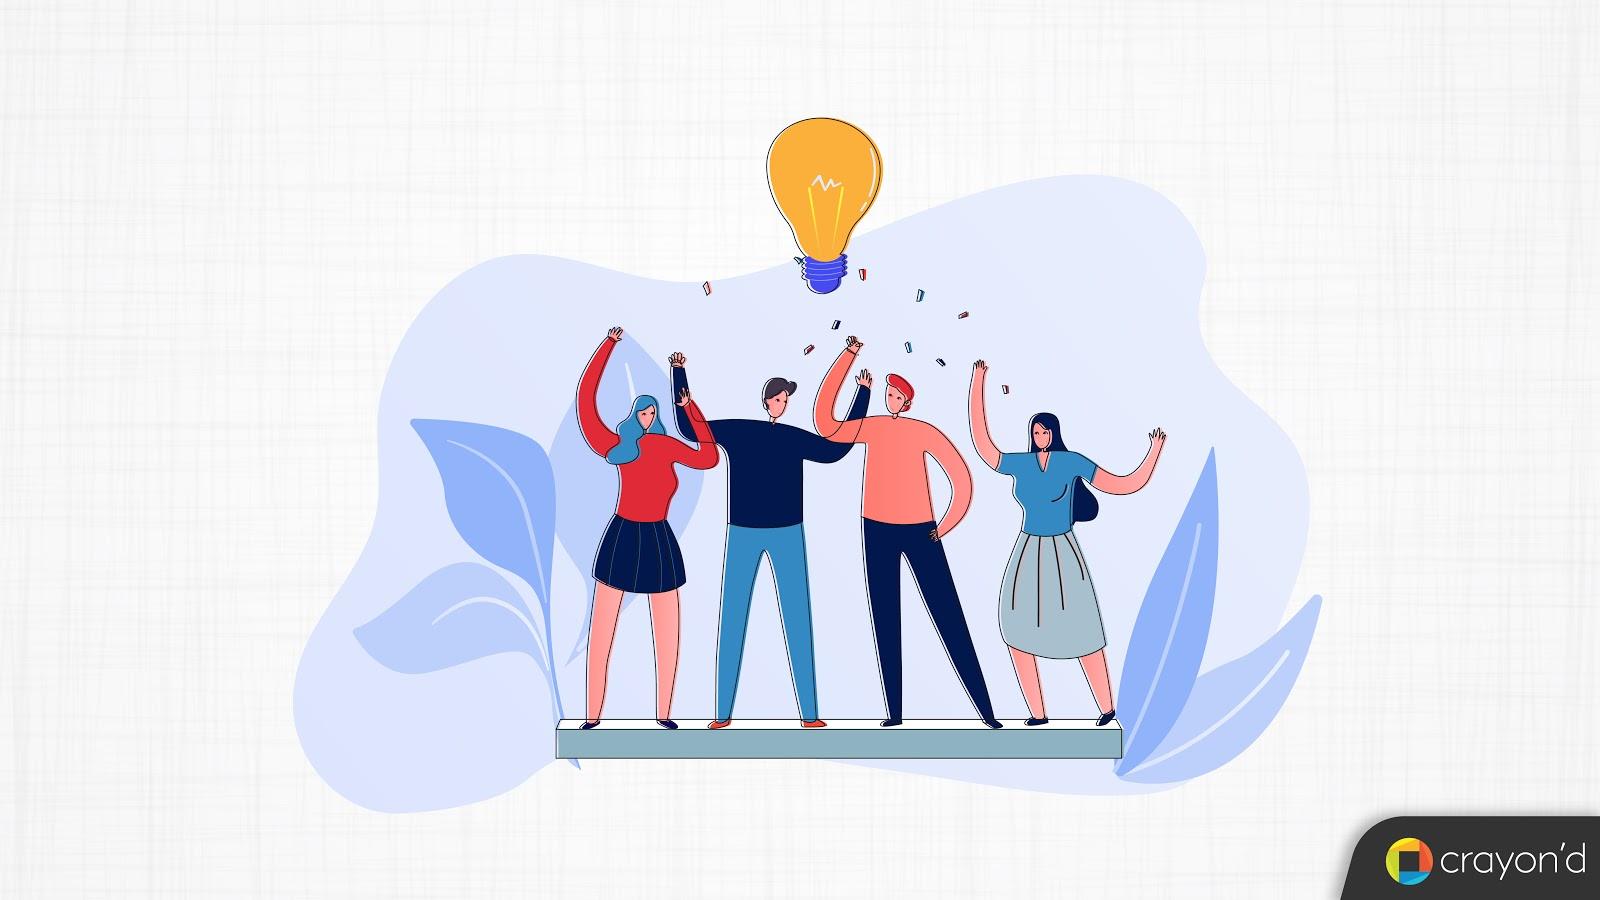 Product Team having common goals